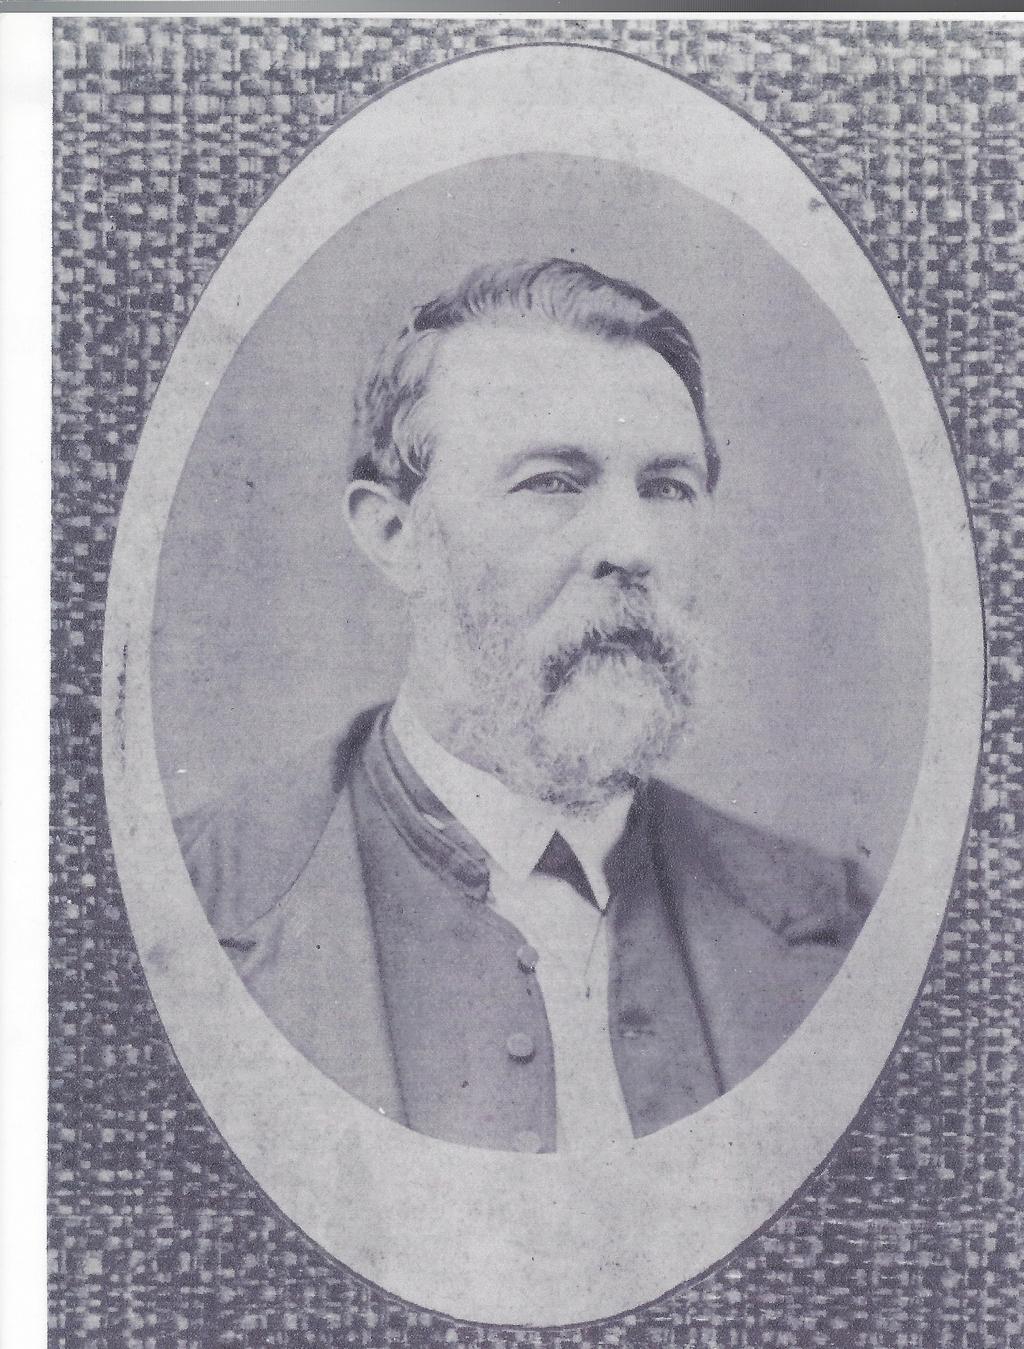 Pierre Auguste de Lanux (Hawaii, USA)